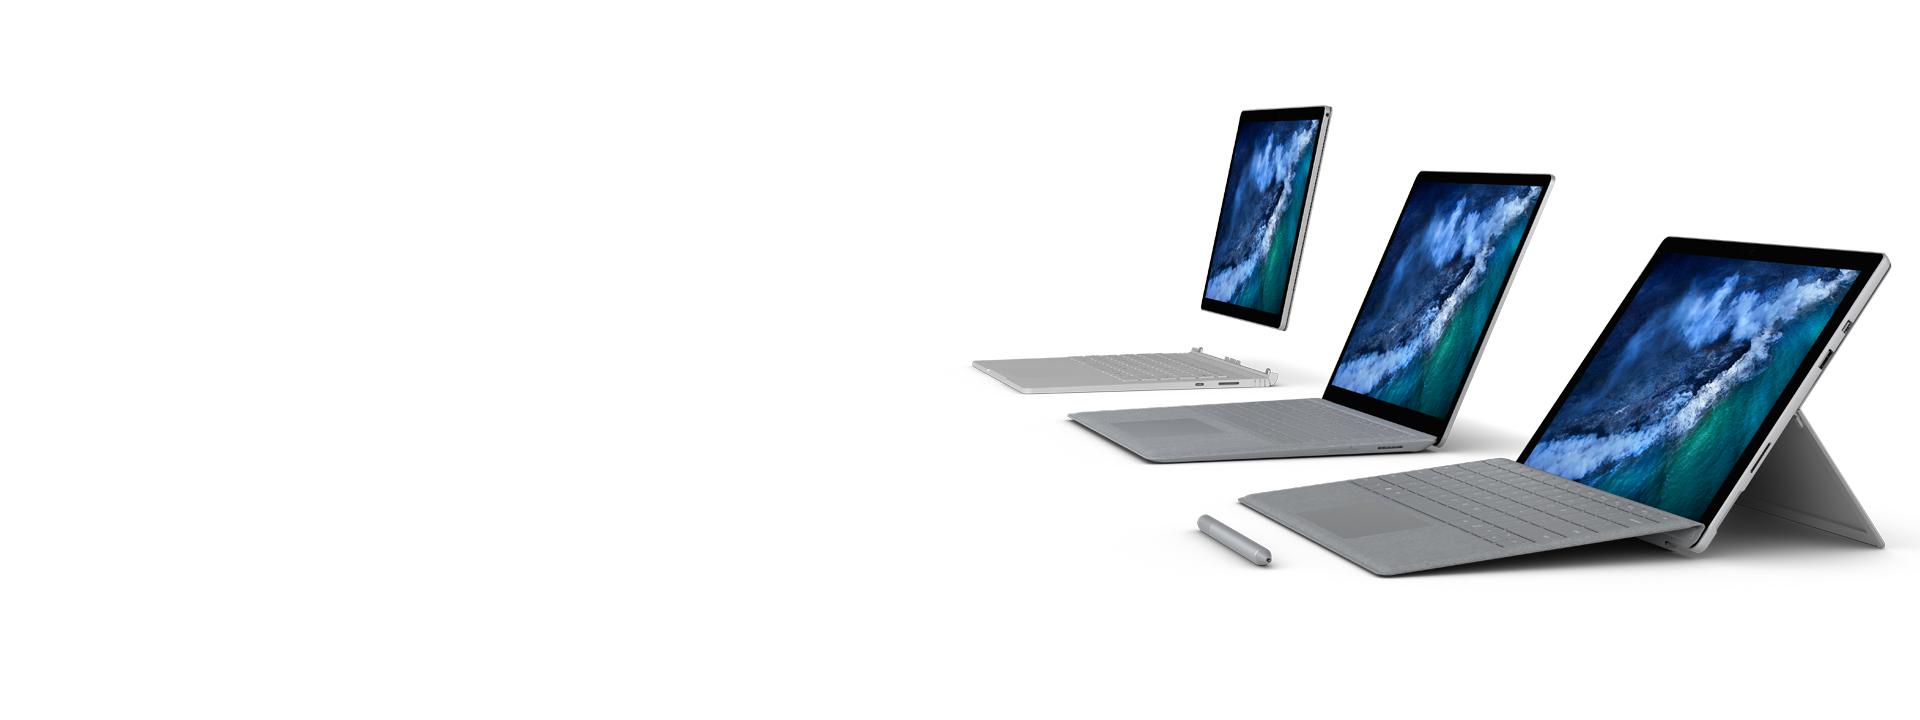 Die Surface-Familie: Surface Pro, Surface Laptop und Surface Book 2